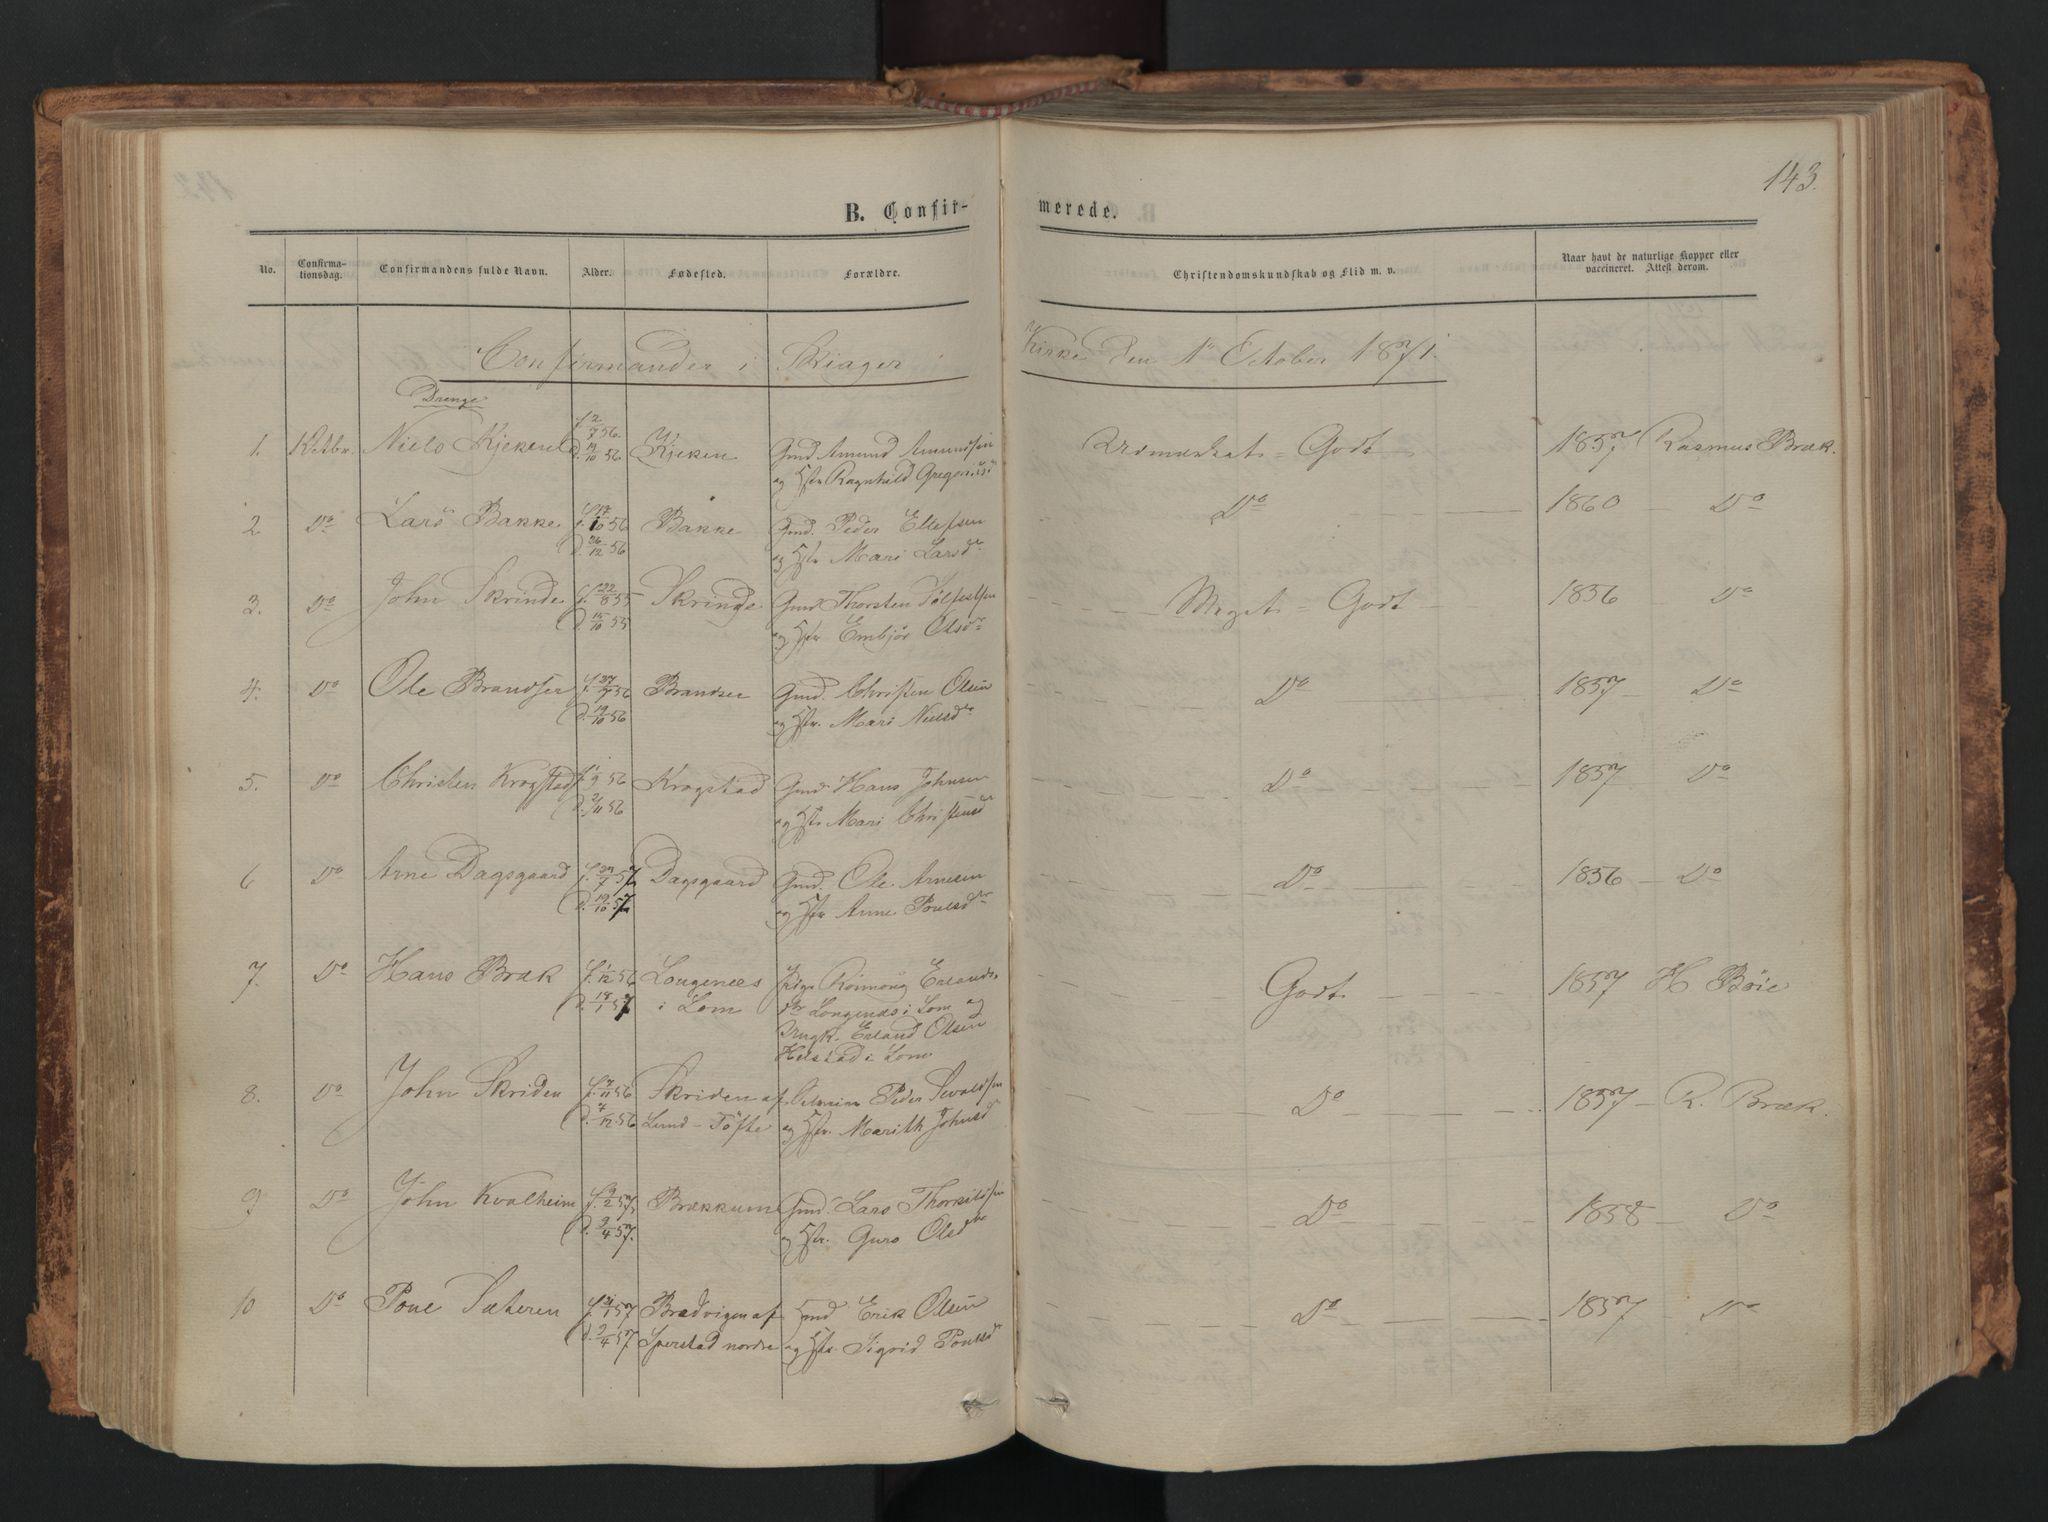 SAH, Skjåk prestekontor, Ministerialbok nr. 1, 1863-1879, s. 143